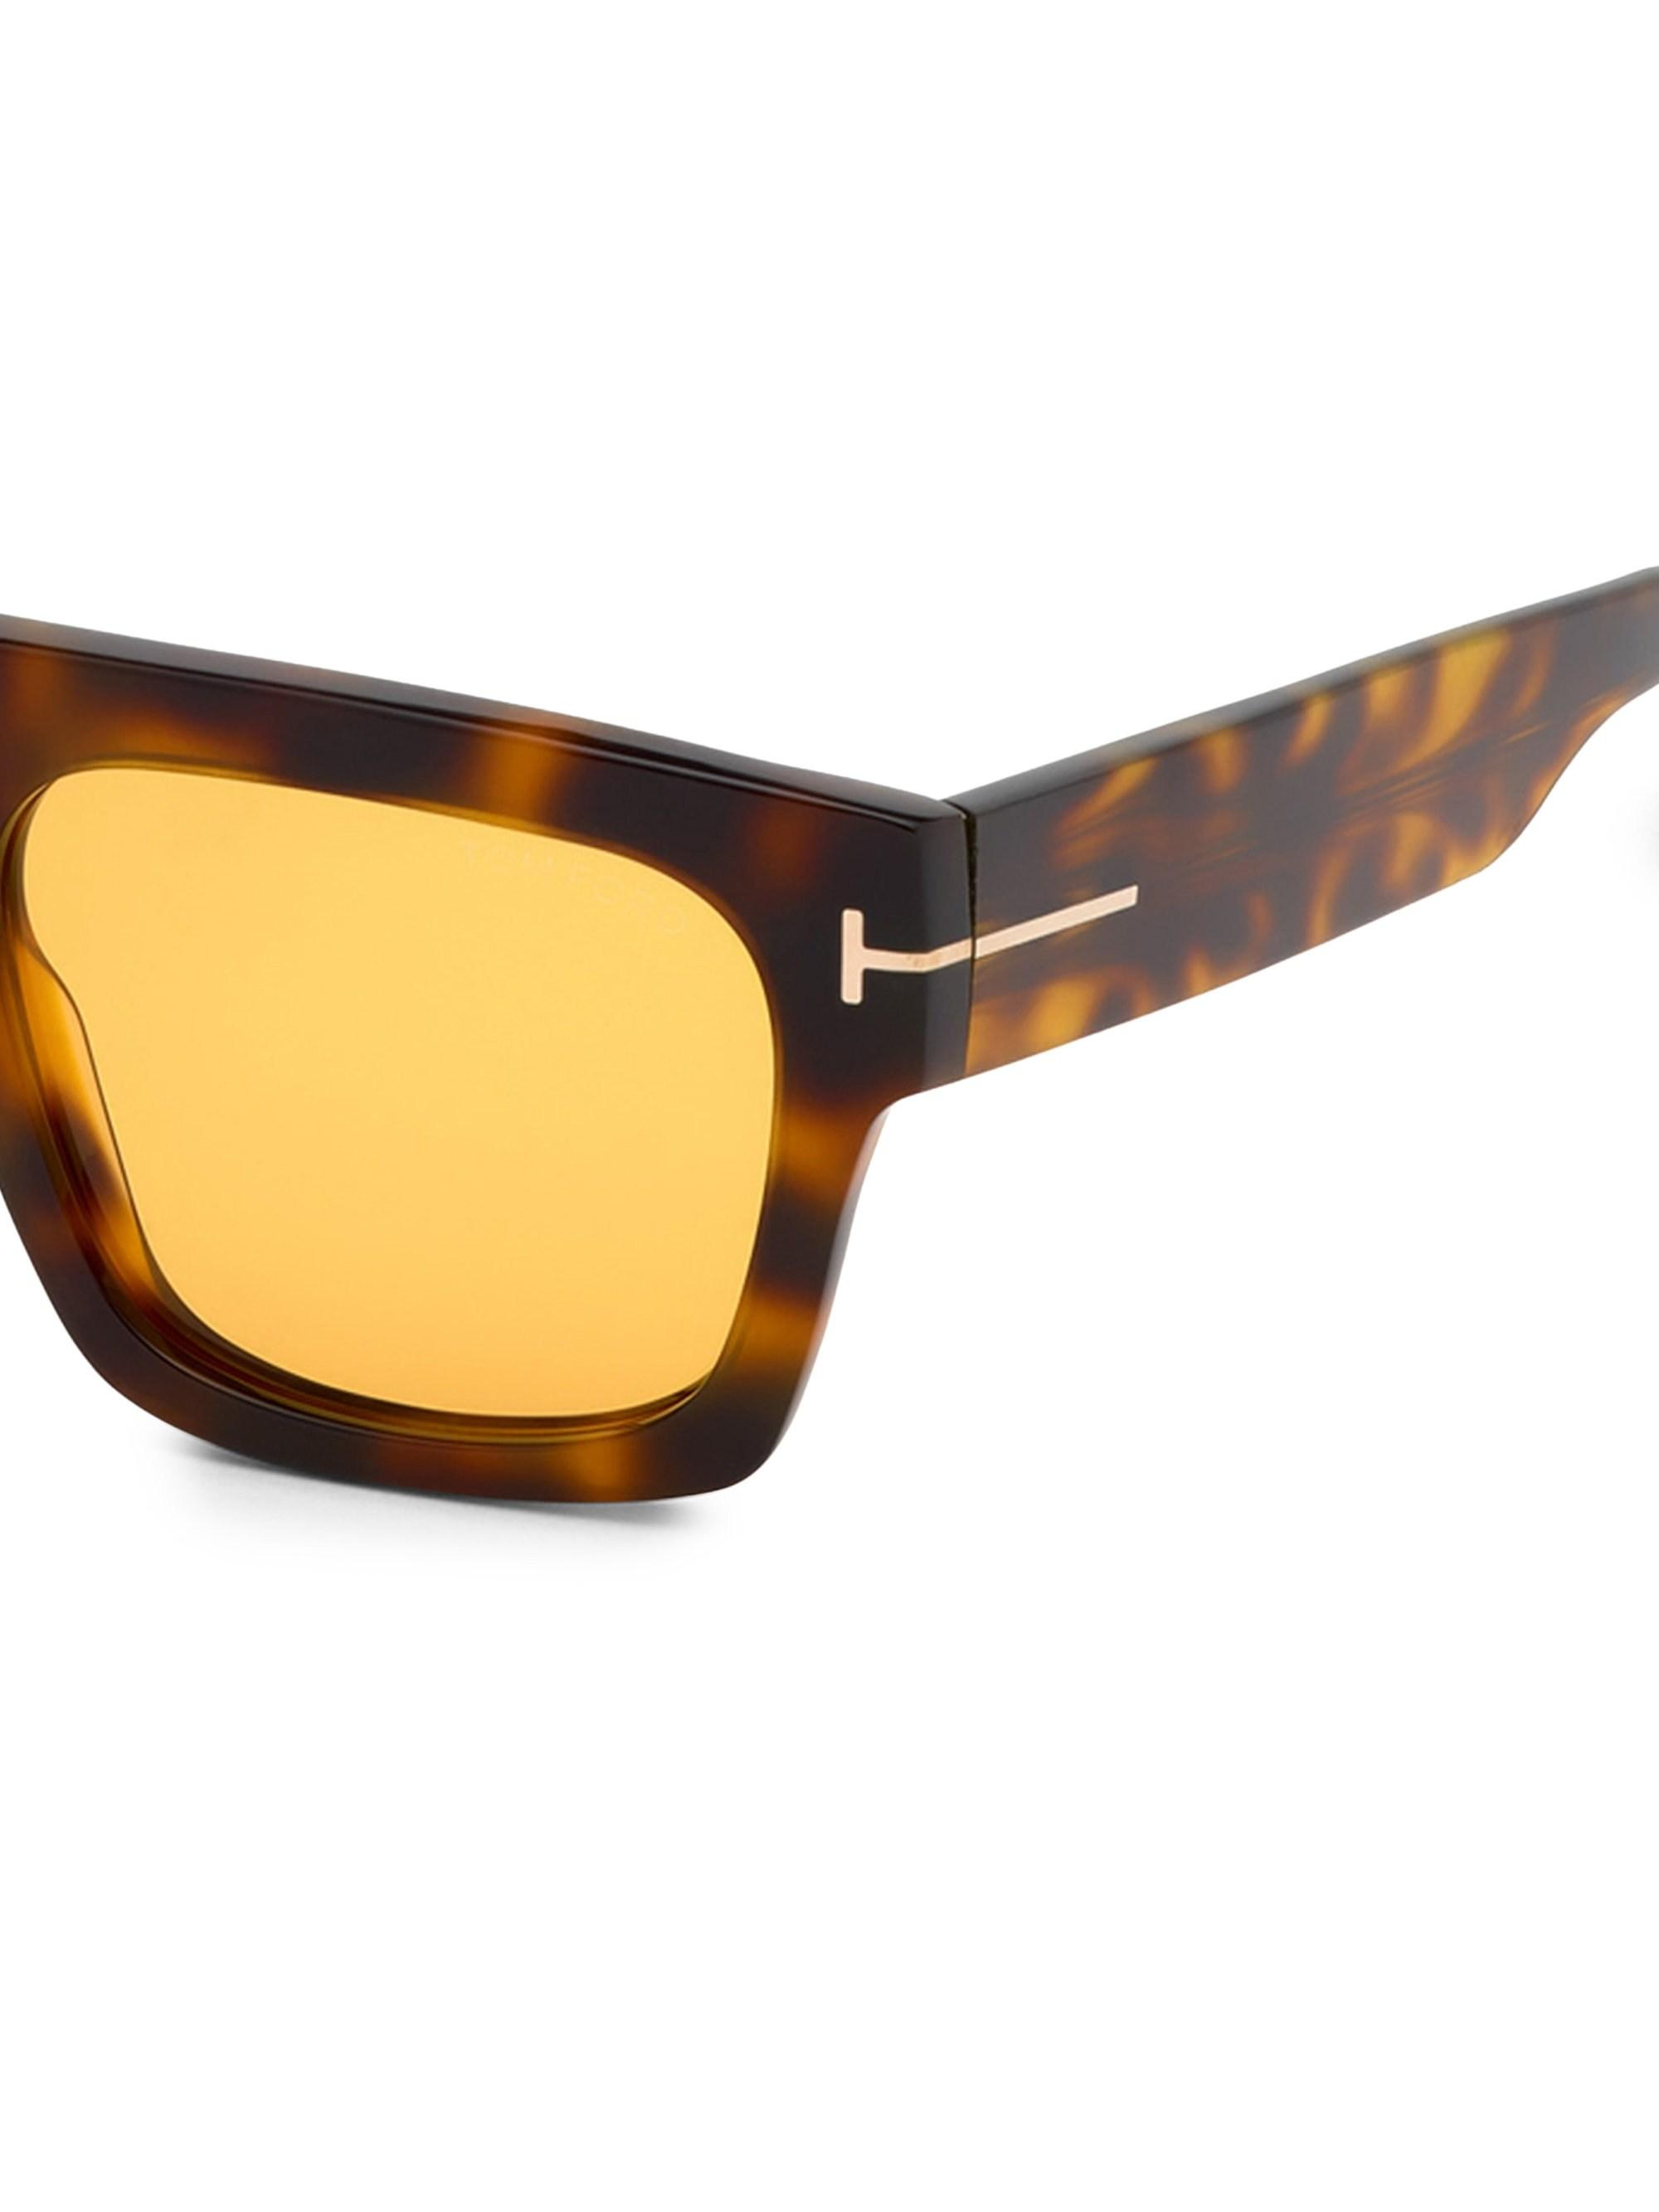 1d86dba7075 Tom Ford - Multicolor Fausto 53mm Square Sunglasses for Men - Lyst. View  fullscreen